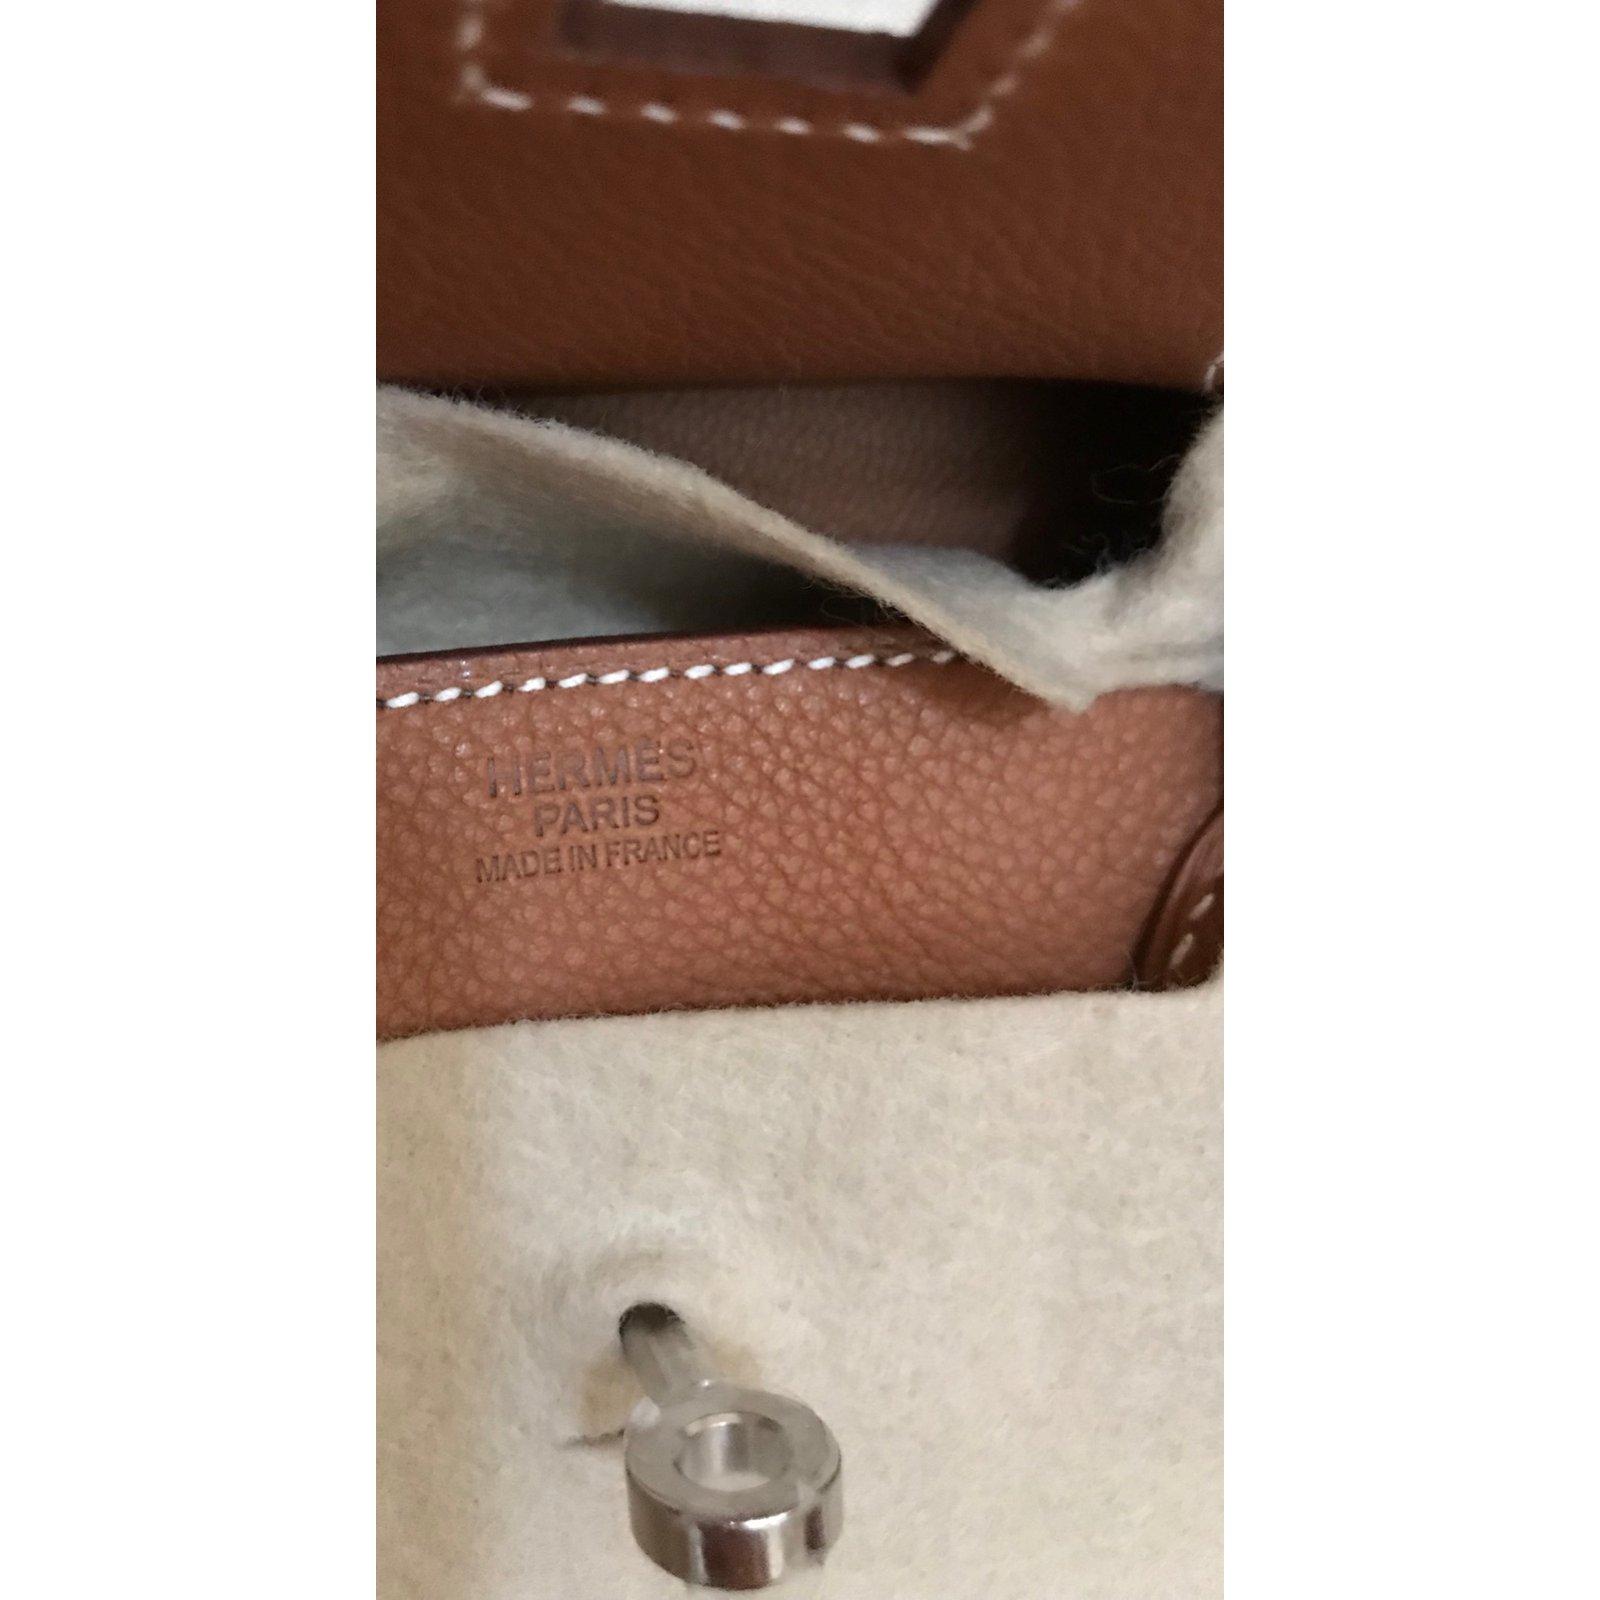 e8ec62e8fee0 Hermès Birkin 30 Fauve Barenia with Palladium Hardware Totes Leather Brown  ref.91277 - Joli Closet